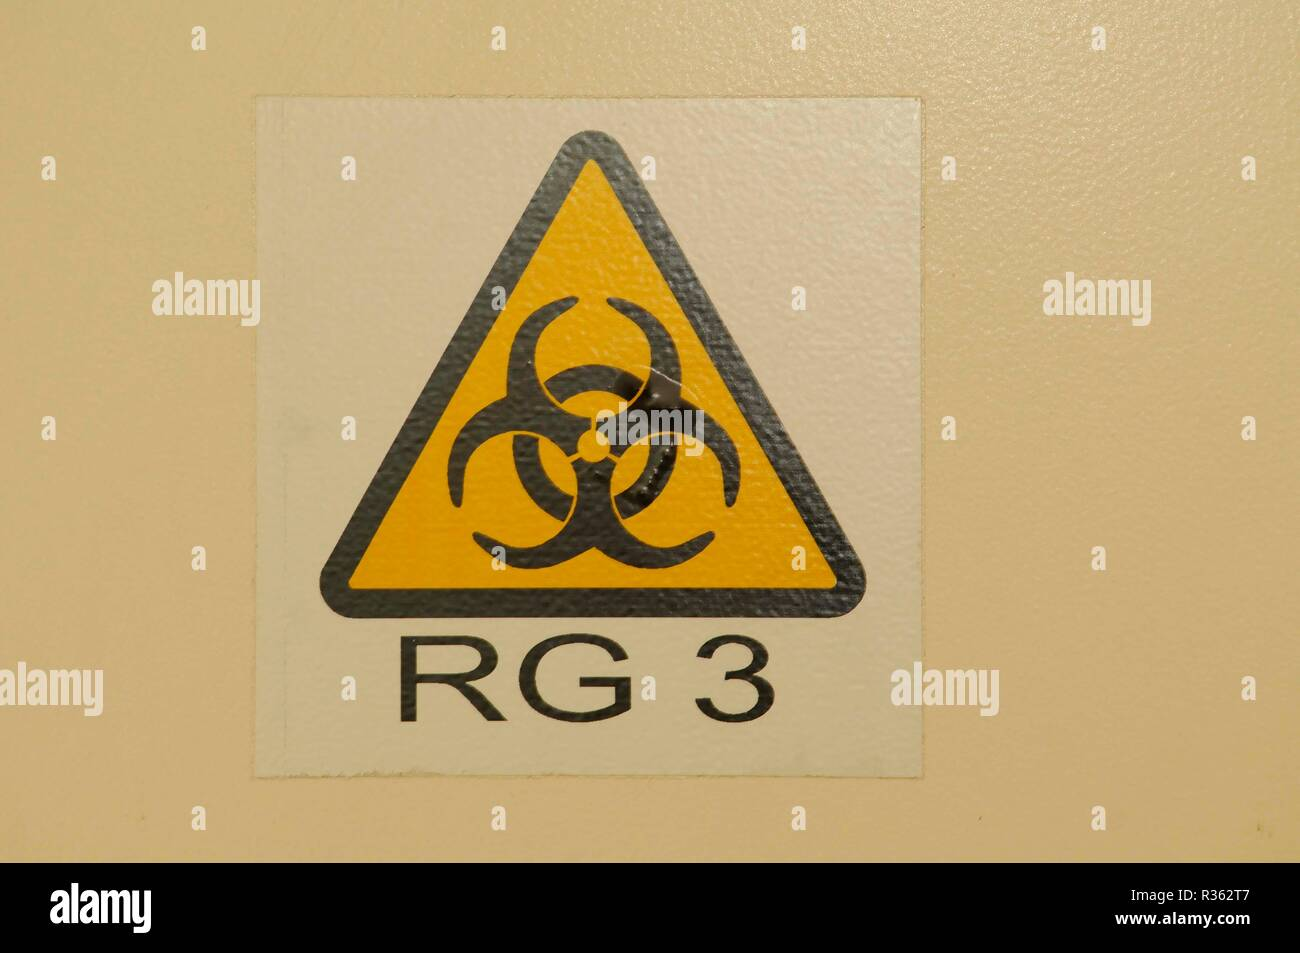 biohazard,symbol,logo,danger,disease hazard,biohazard,epidemics,hygiene,clean,pure,healthy - Stock Image